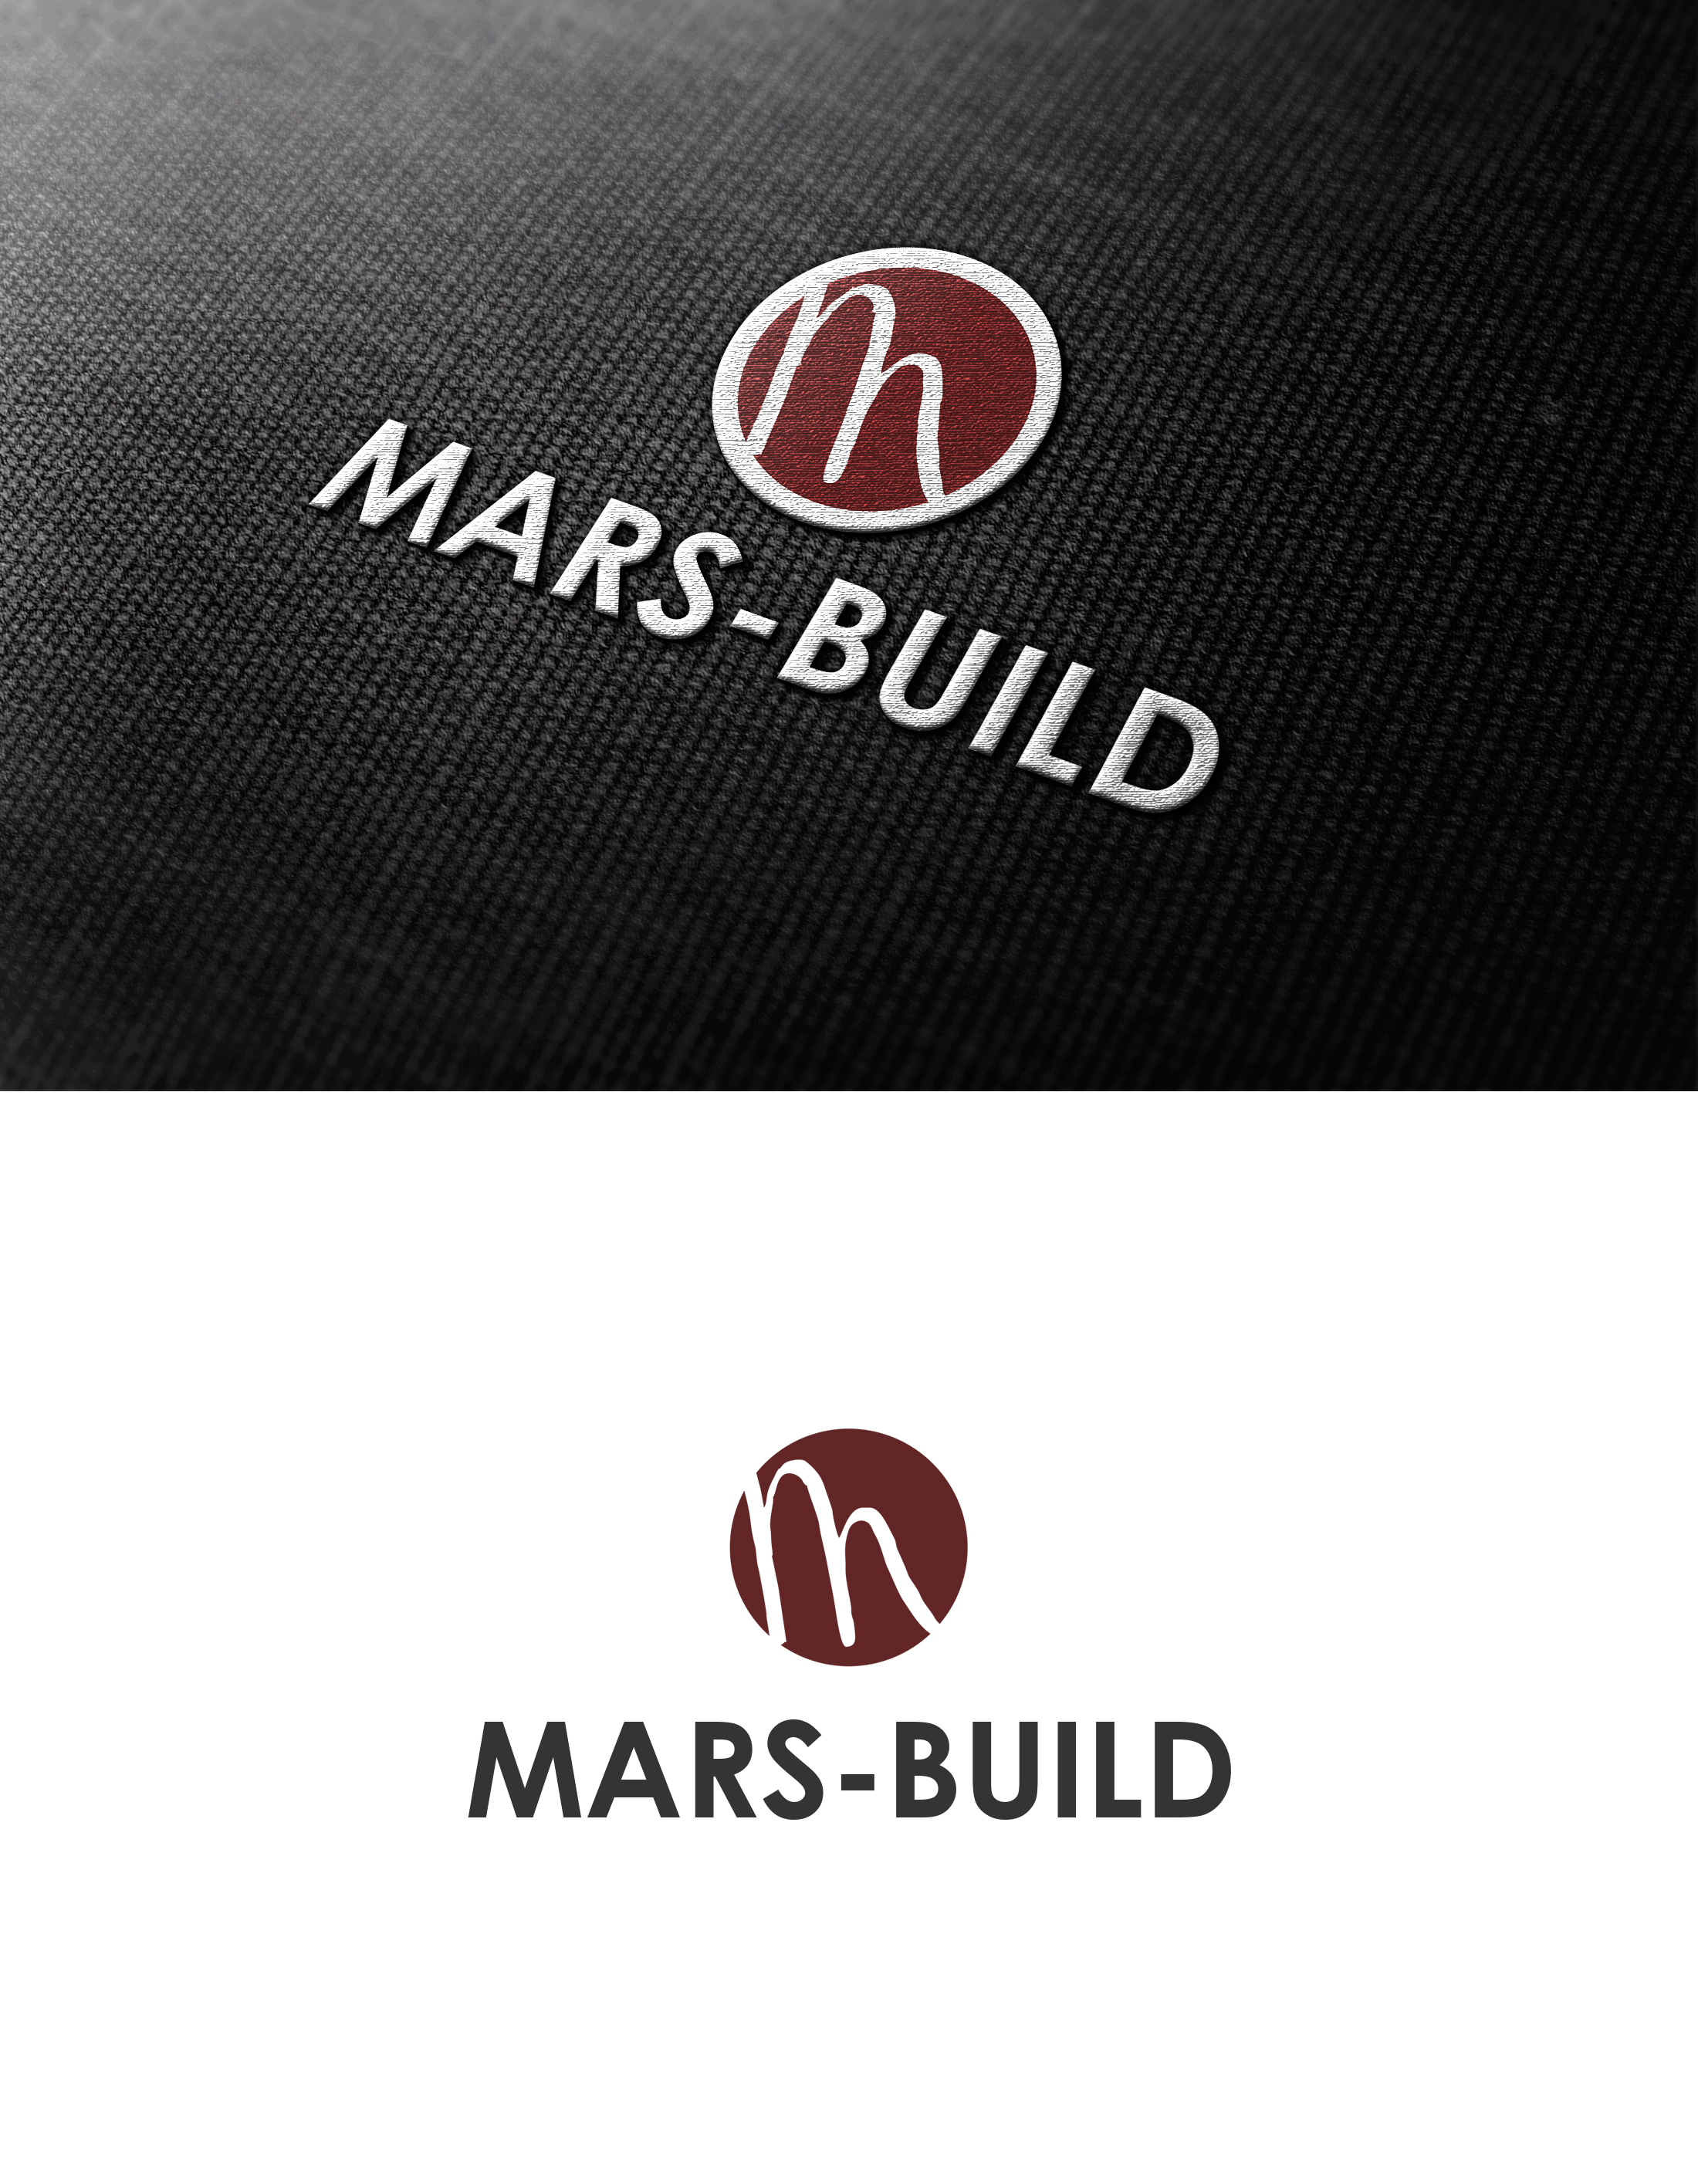 Mars-Build